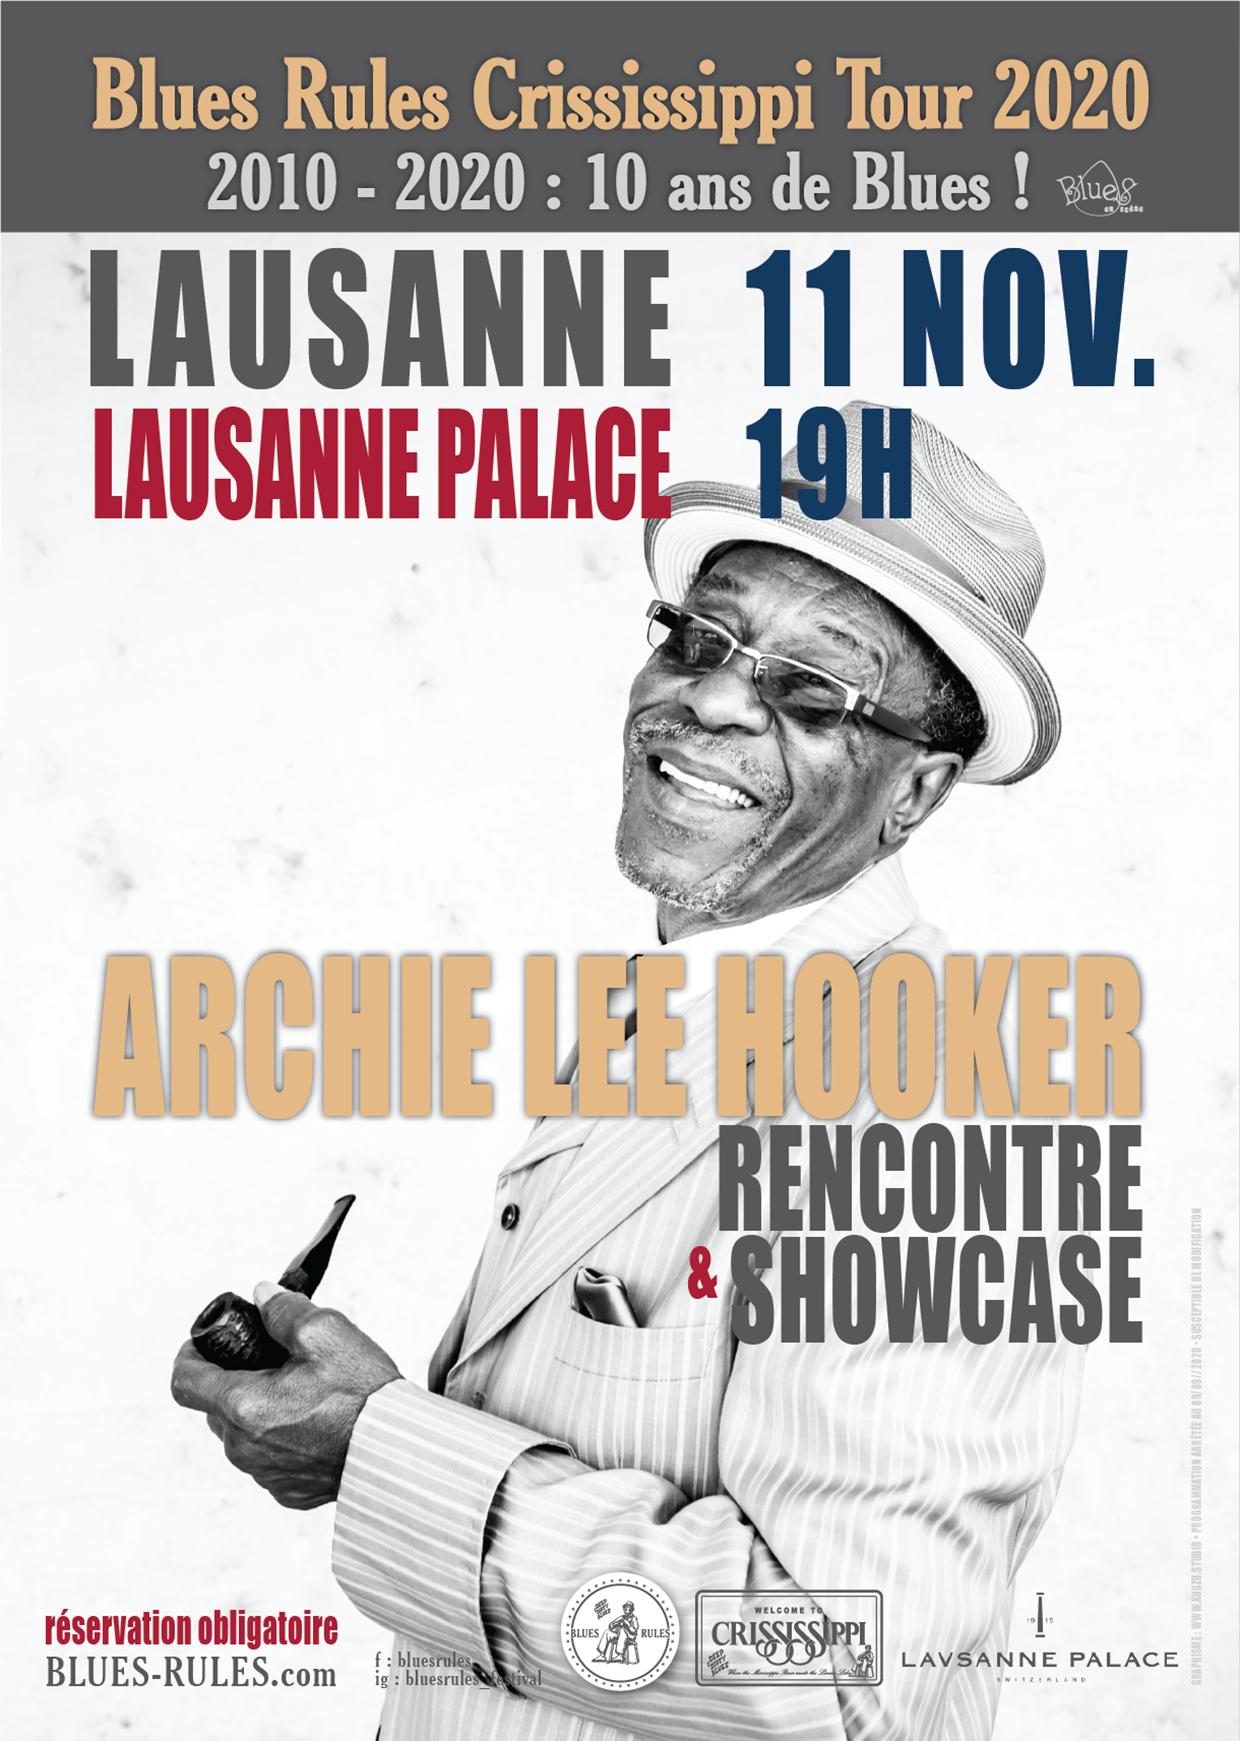 Archie Lee Hooker Lausanne Palace